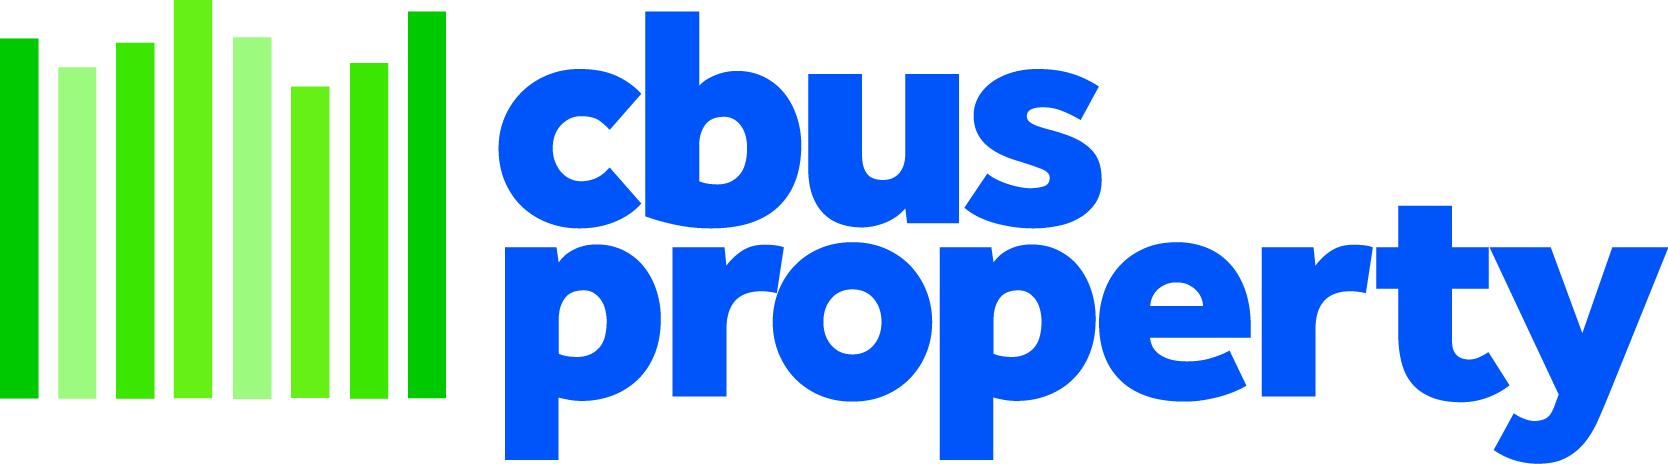 Cbus Property Corporate CMYK